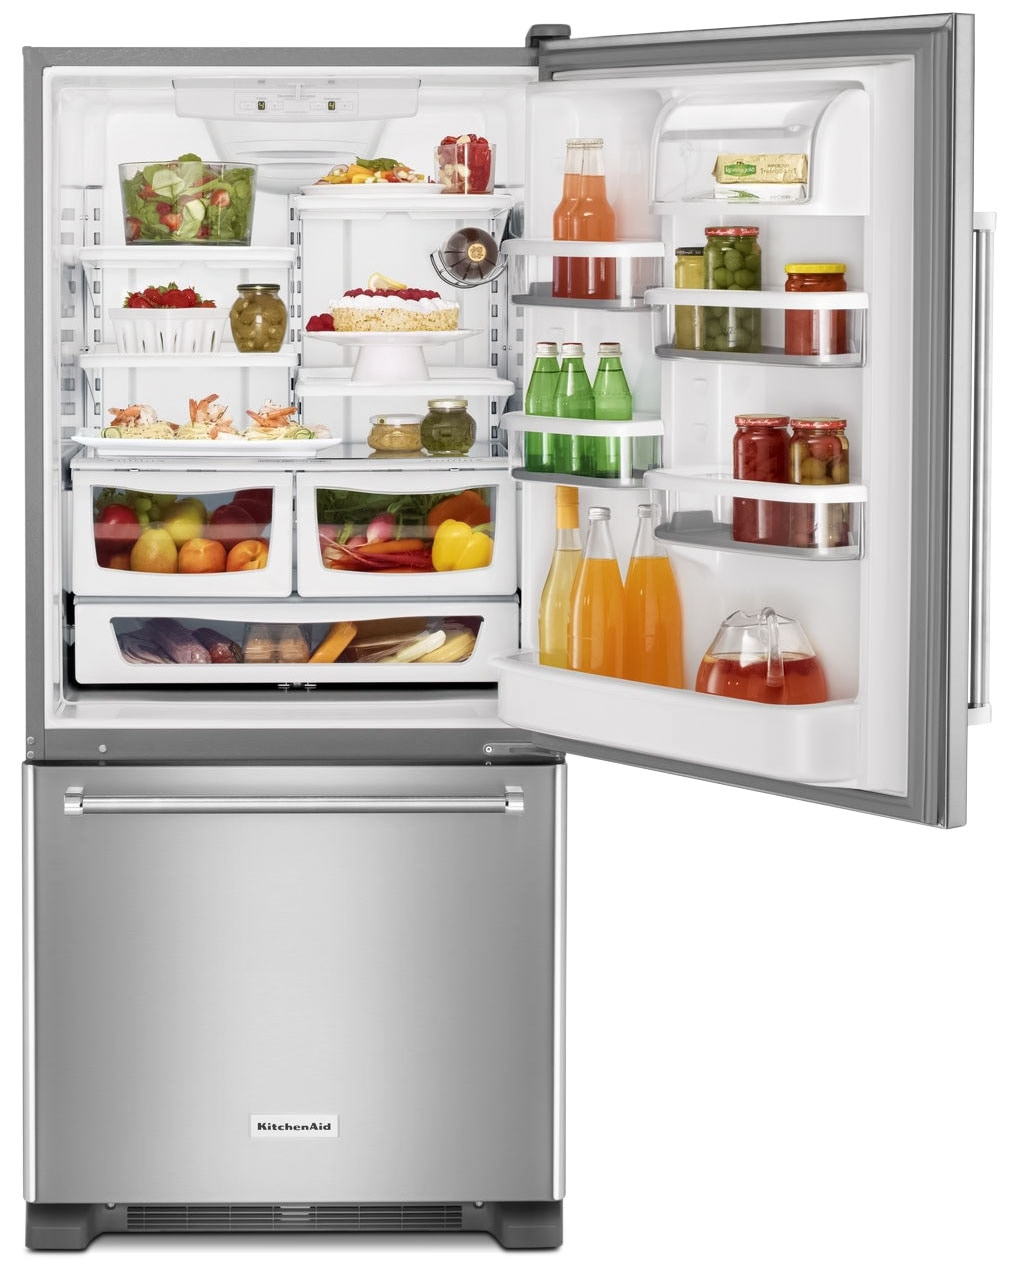 KitchenAid Refrigerators - ConsumerAffairs